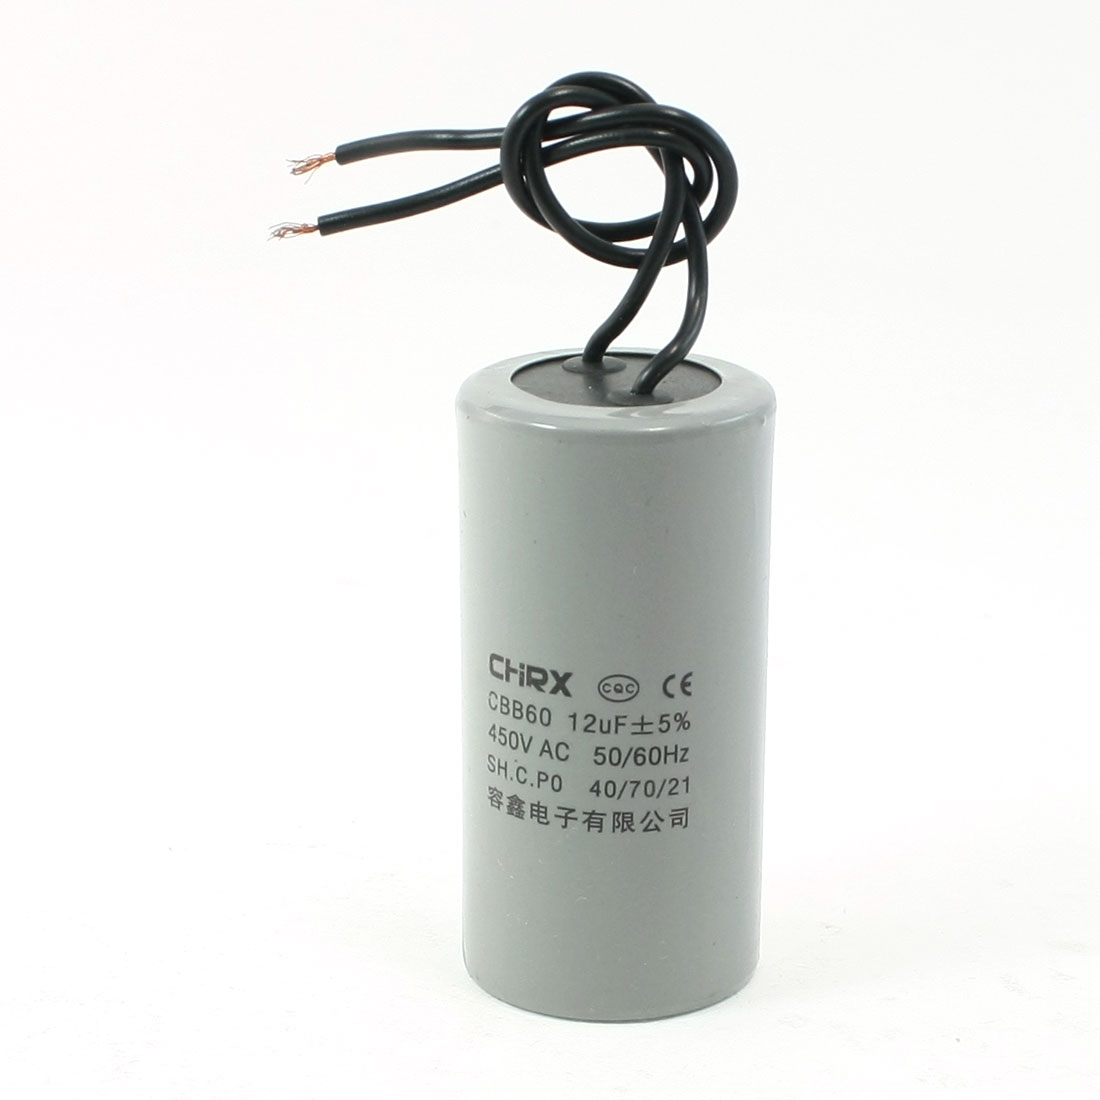 CBB60 AC 450V 12uF Polypropylene Film Motor Running Capacitor Gray